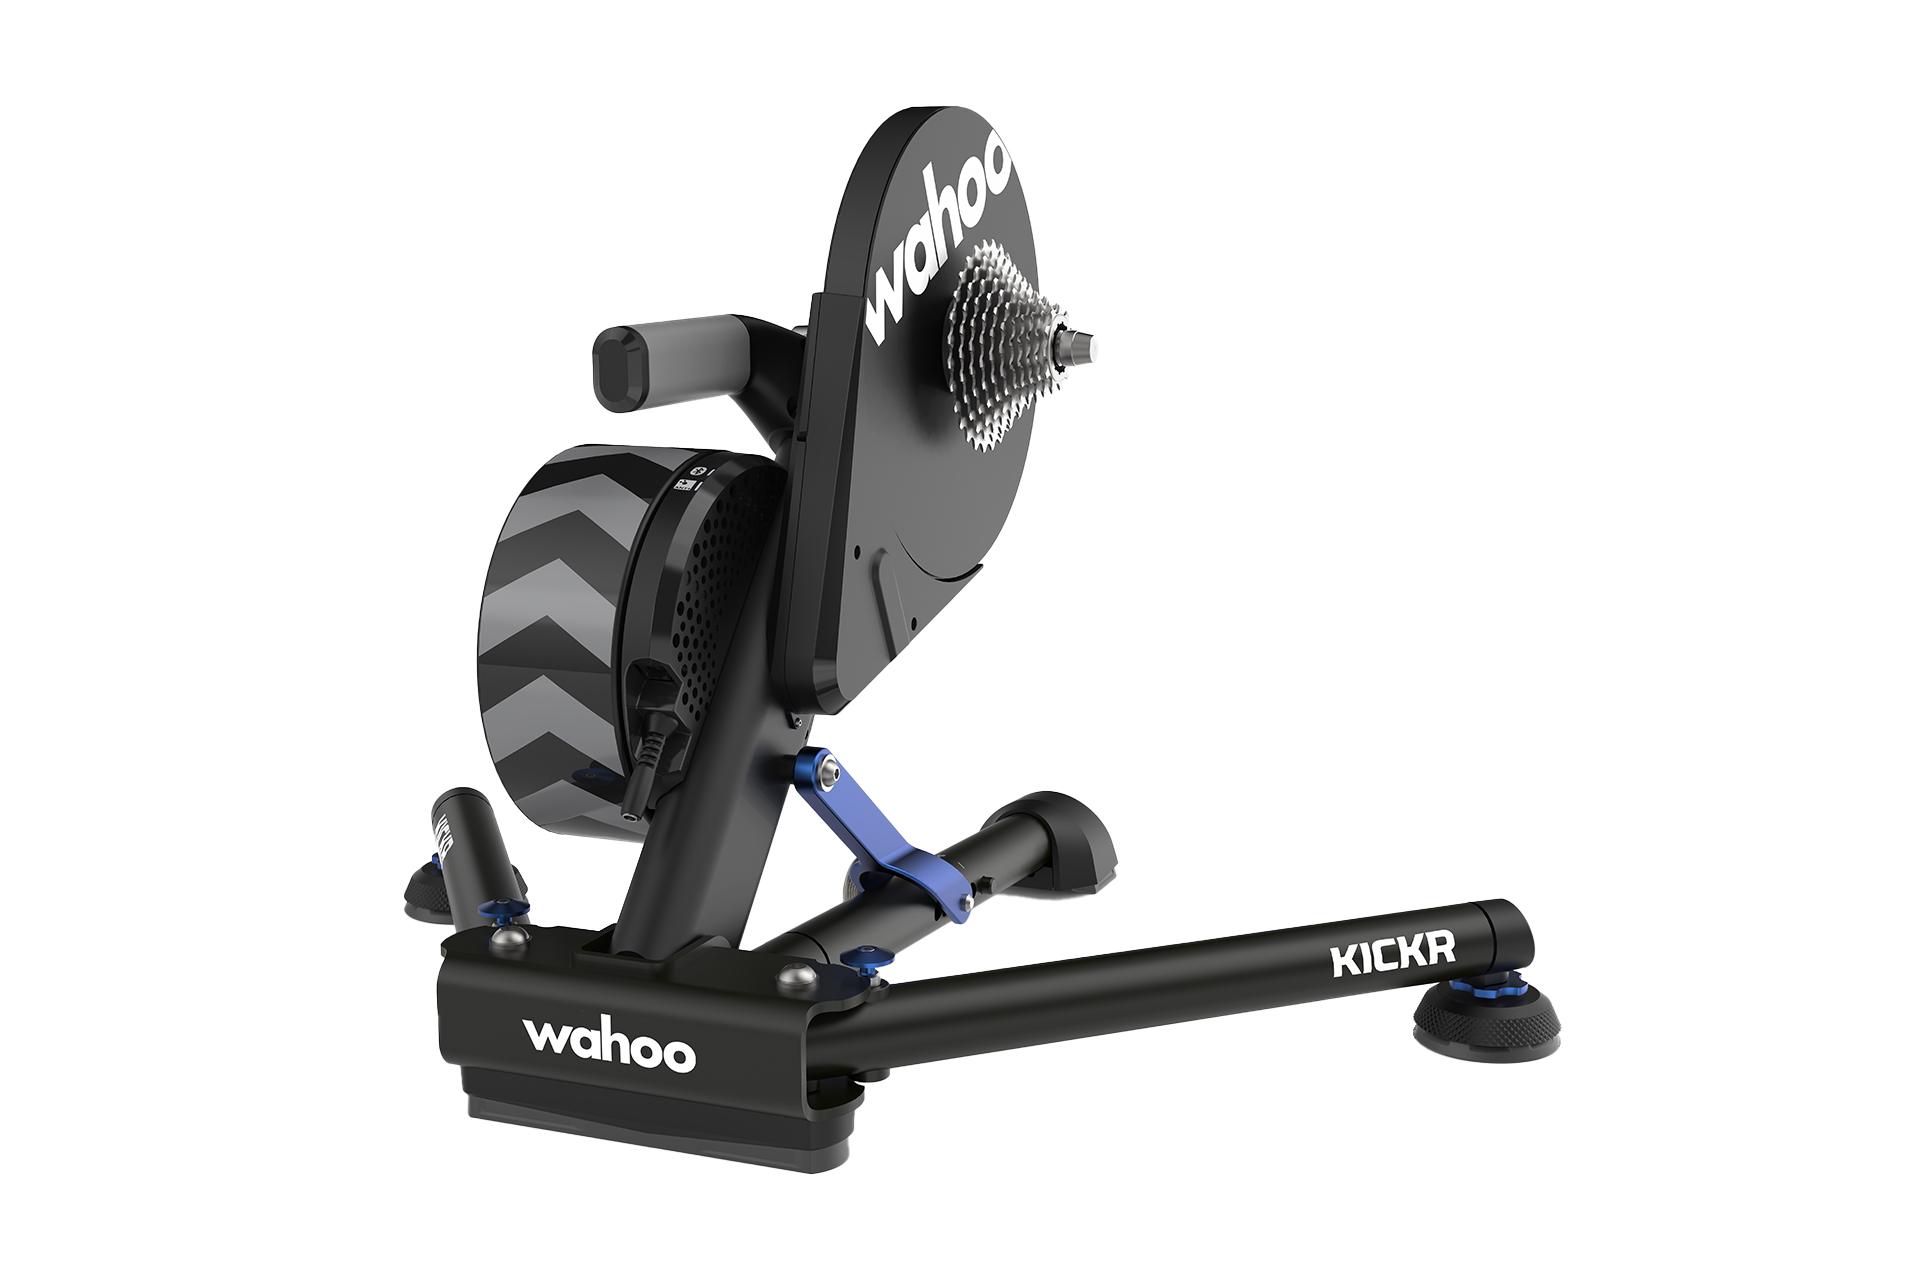 Wahoo-KICKR 2020-Product-01